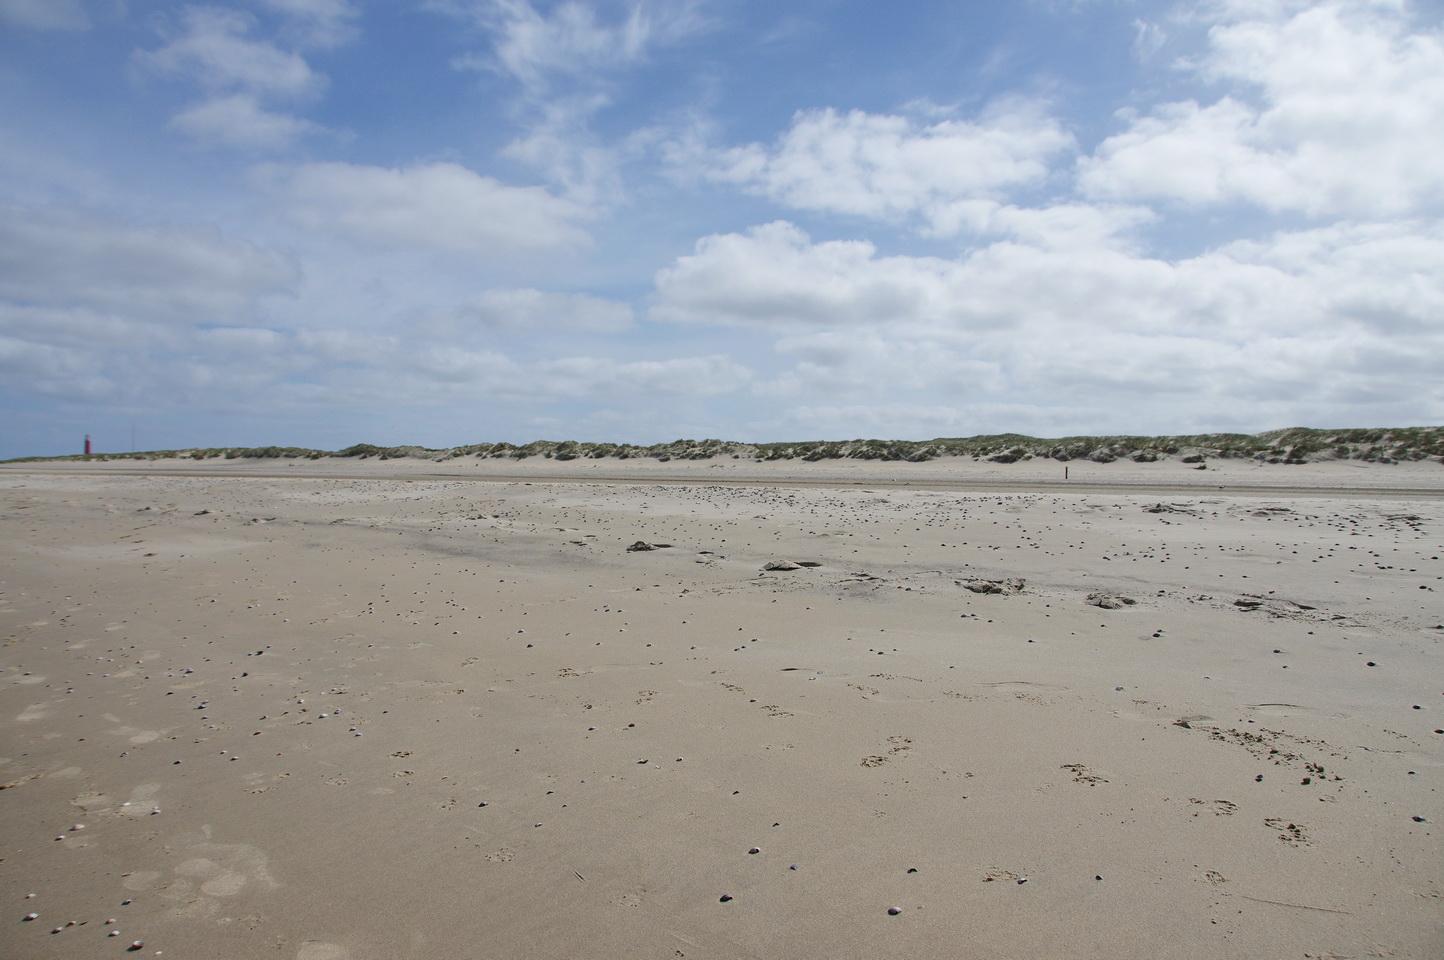 Texel - Strandspaziergang Leuchtturm TH 2